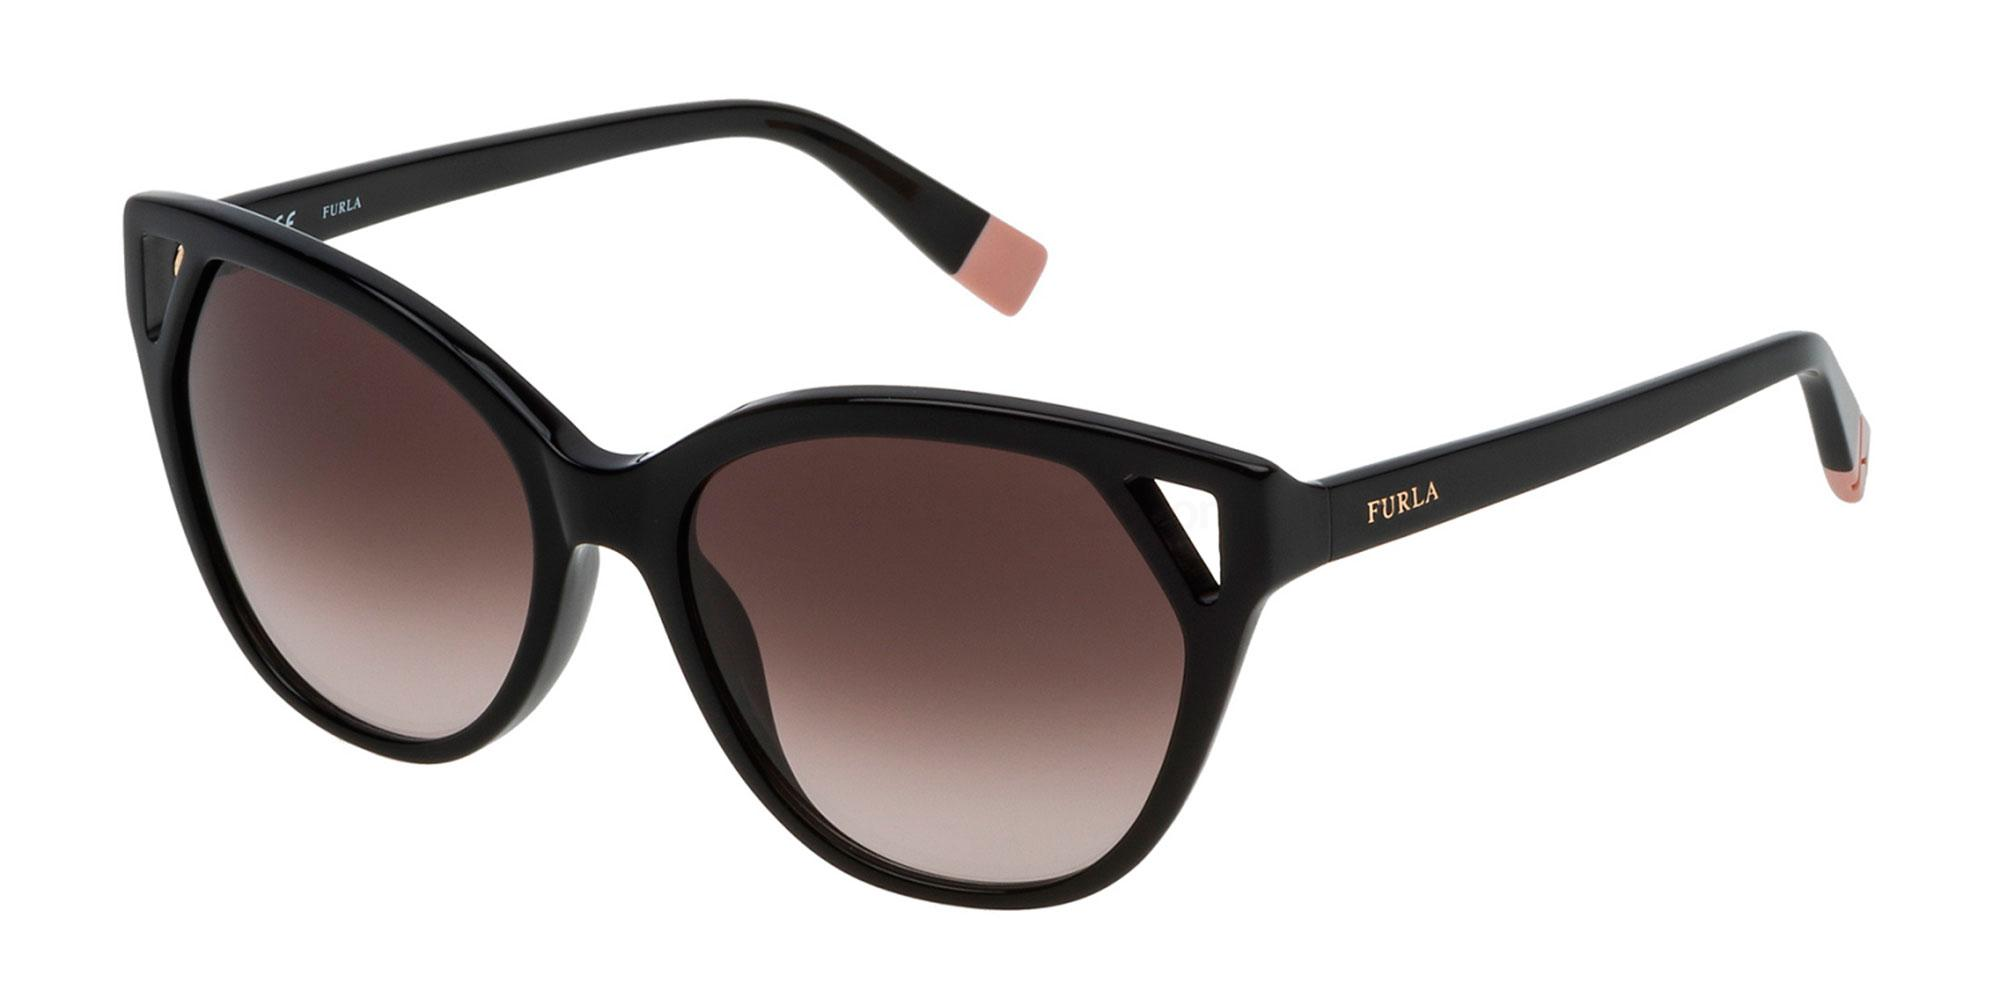 0700 SFU152 Sunglasses, Furla